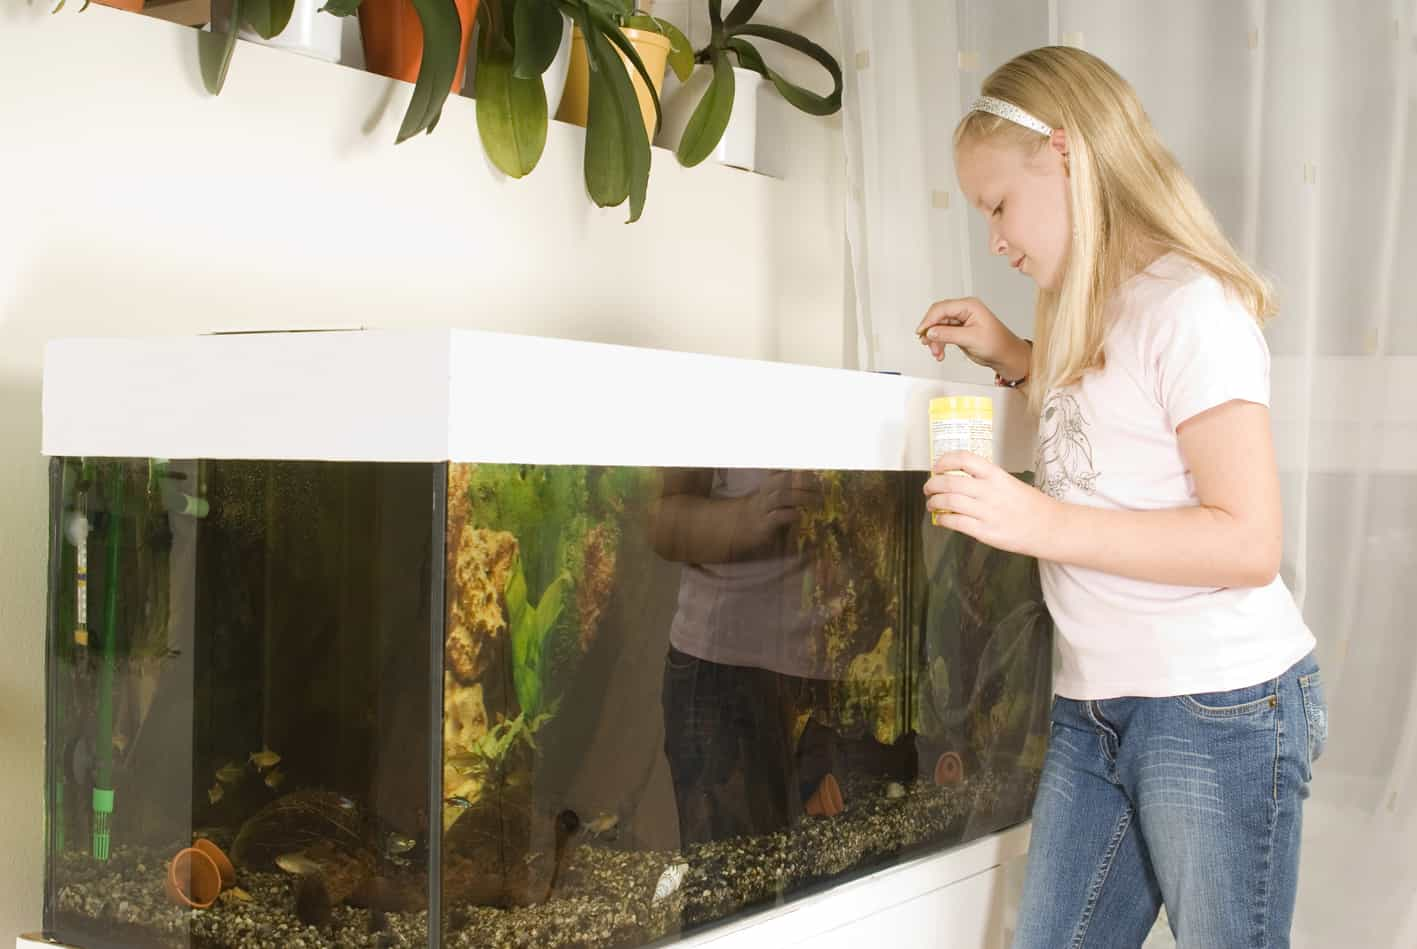 Mädchen füttert Fische